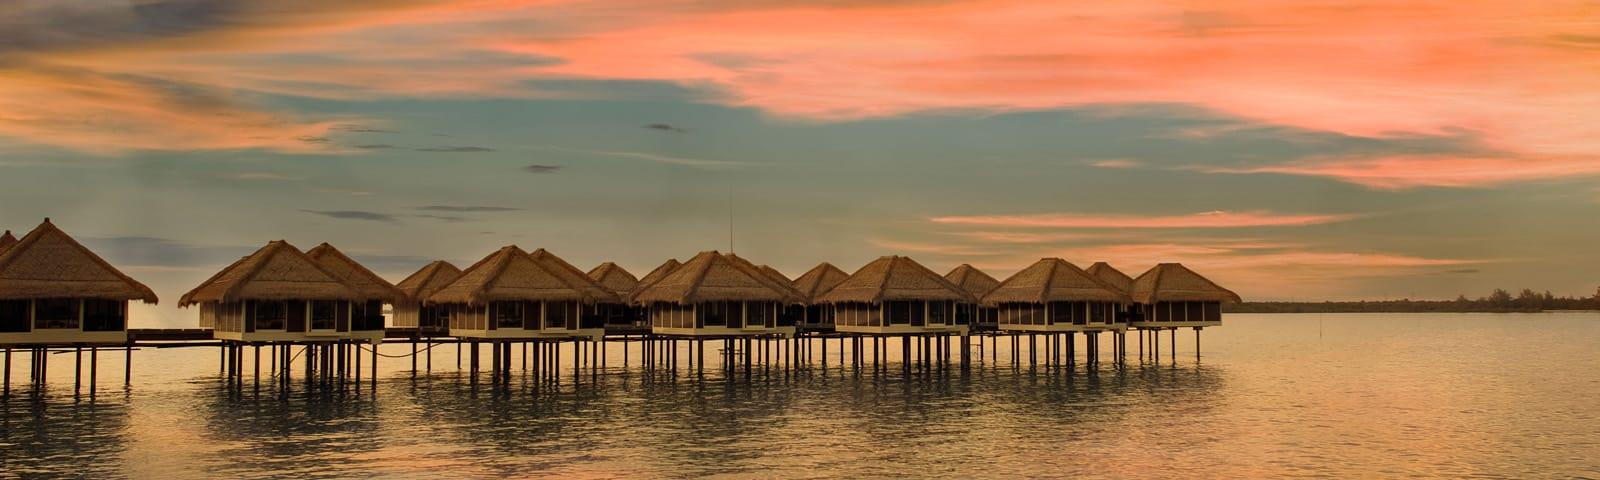 AVANI Sepang hotel promotions on water villas